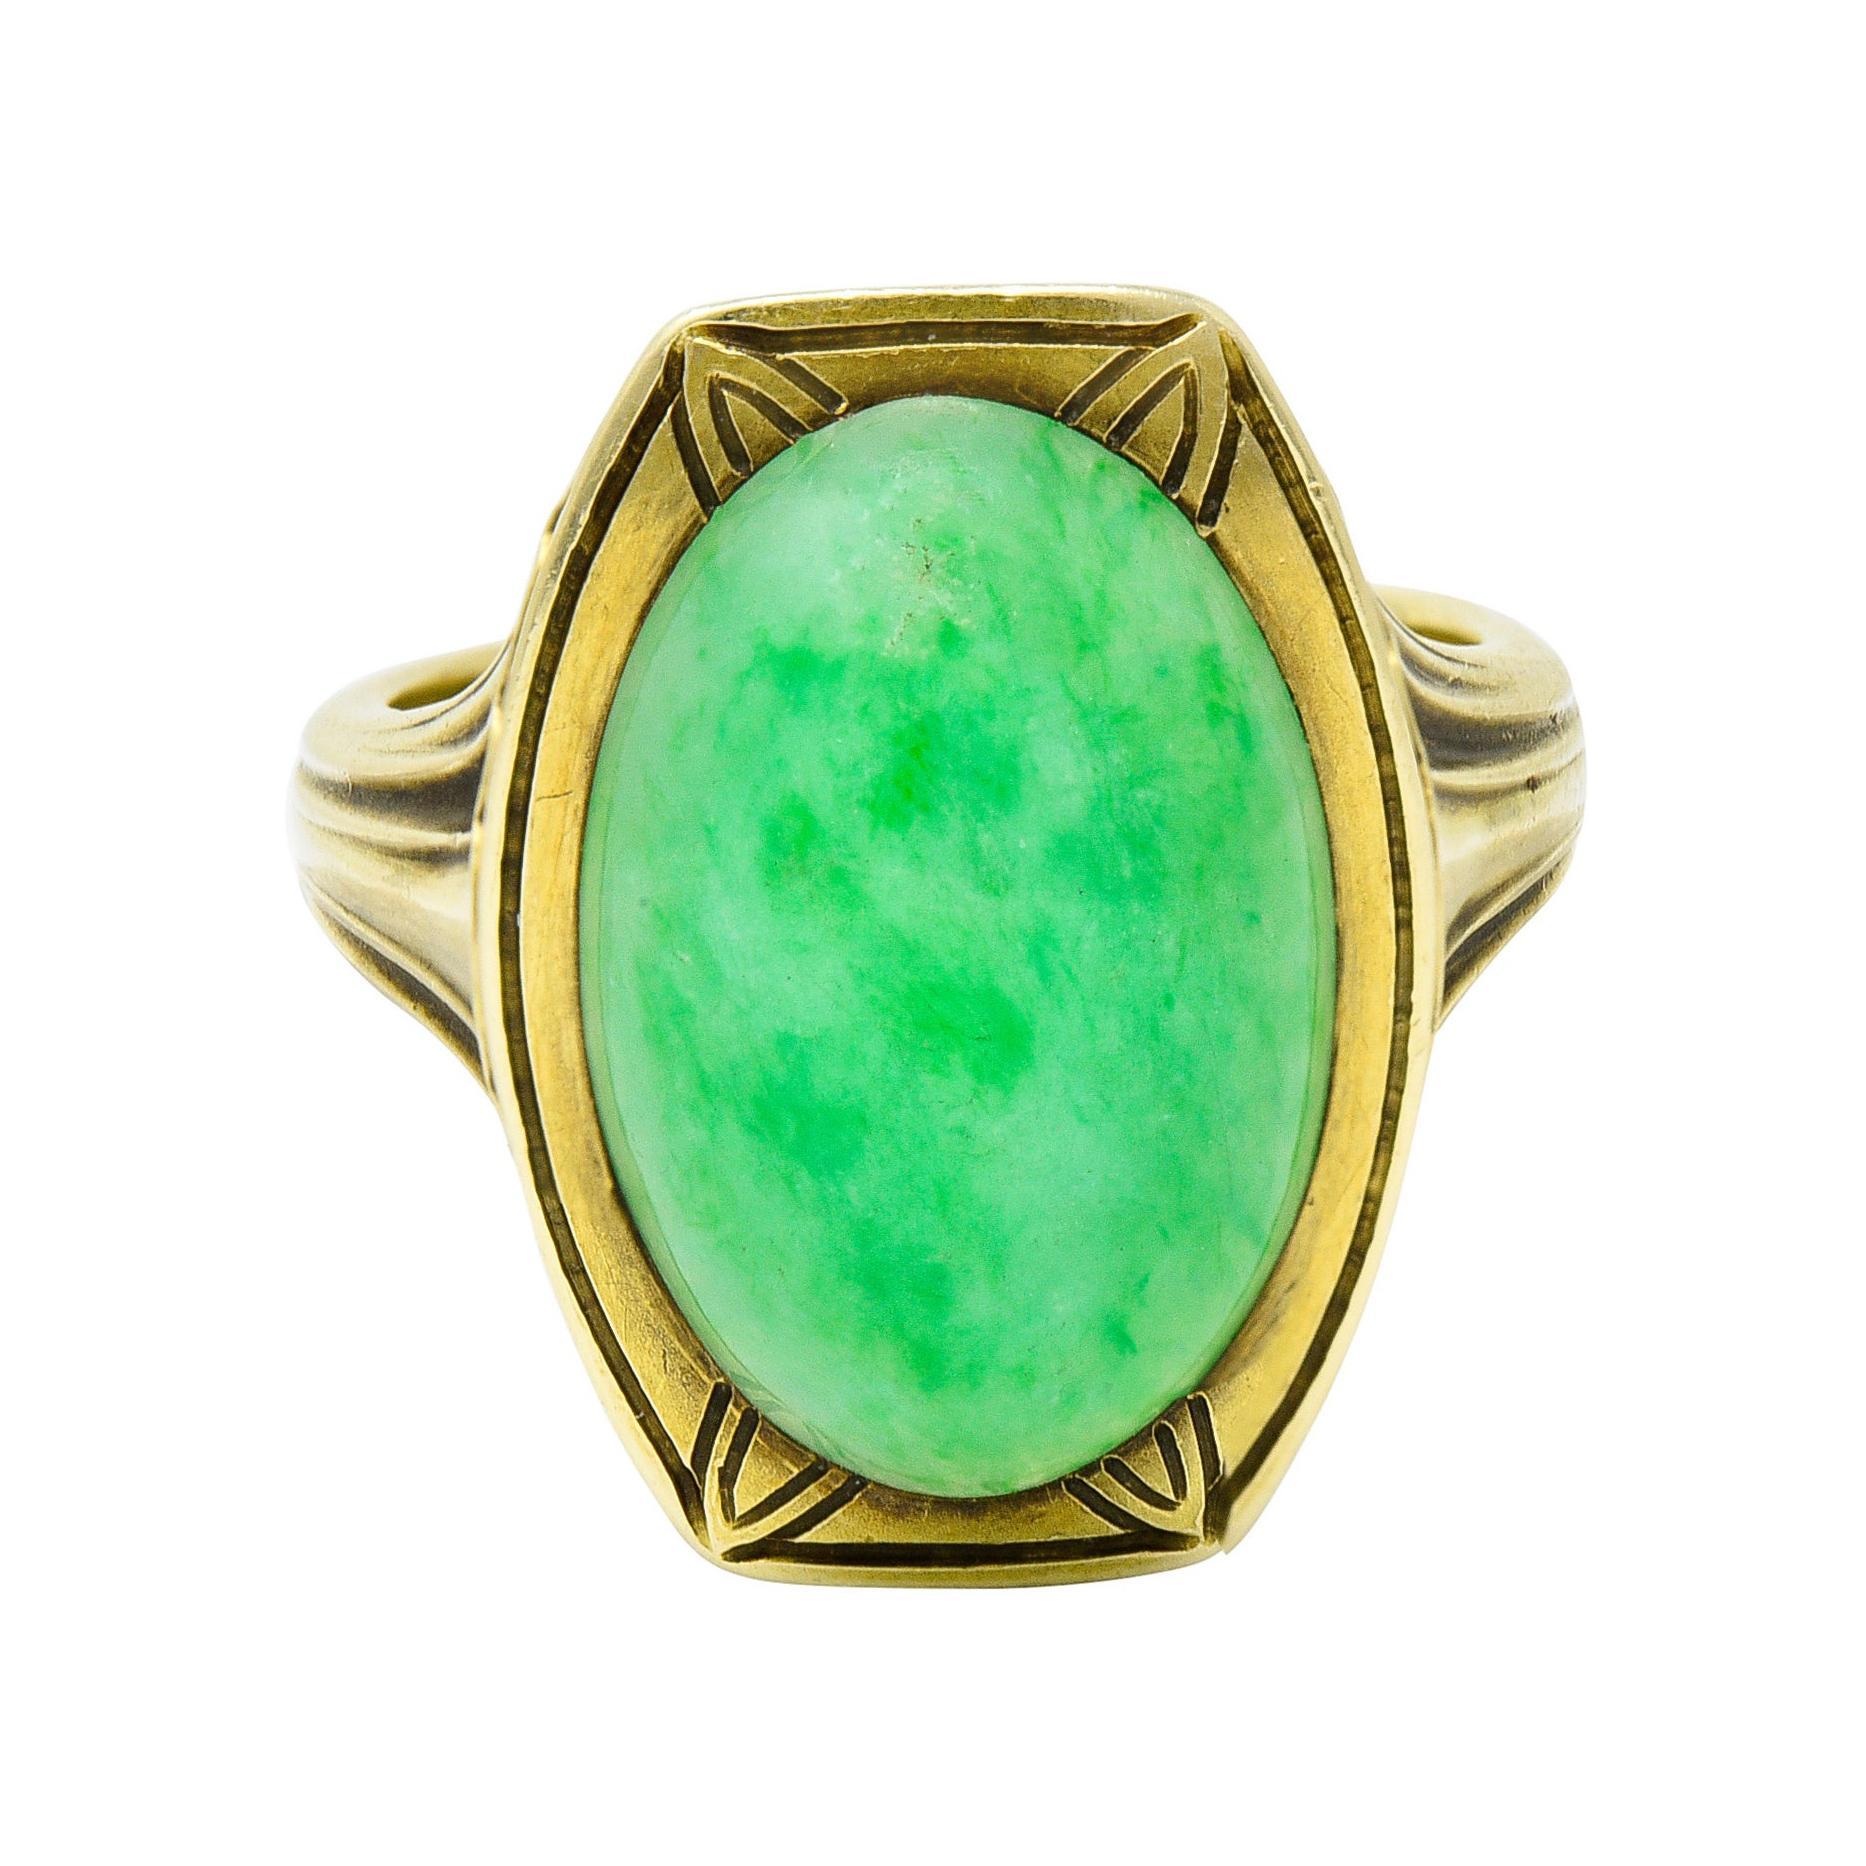 Larter & Sons Art Deco Jadeite Jade Cabochon 14 Karat Gold Lotus Ring